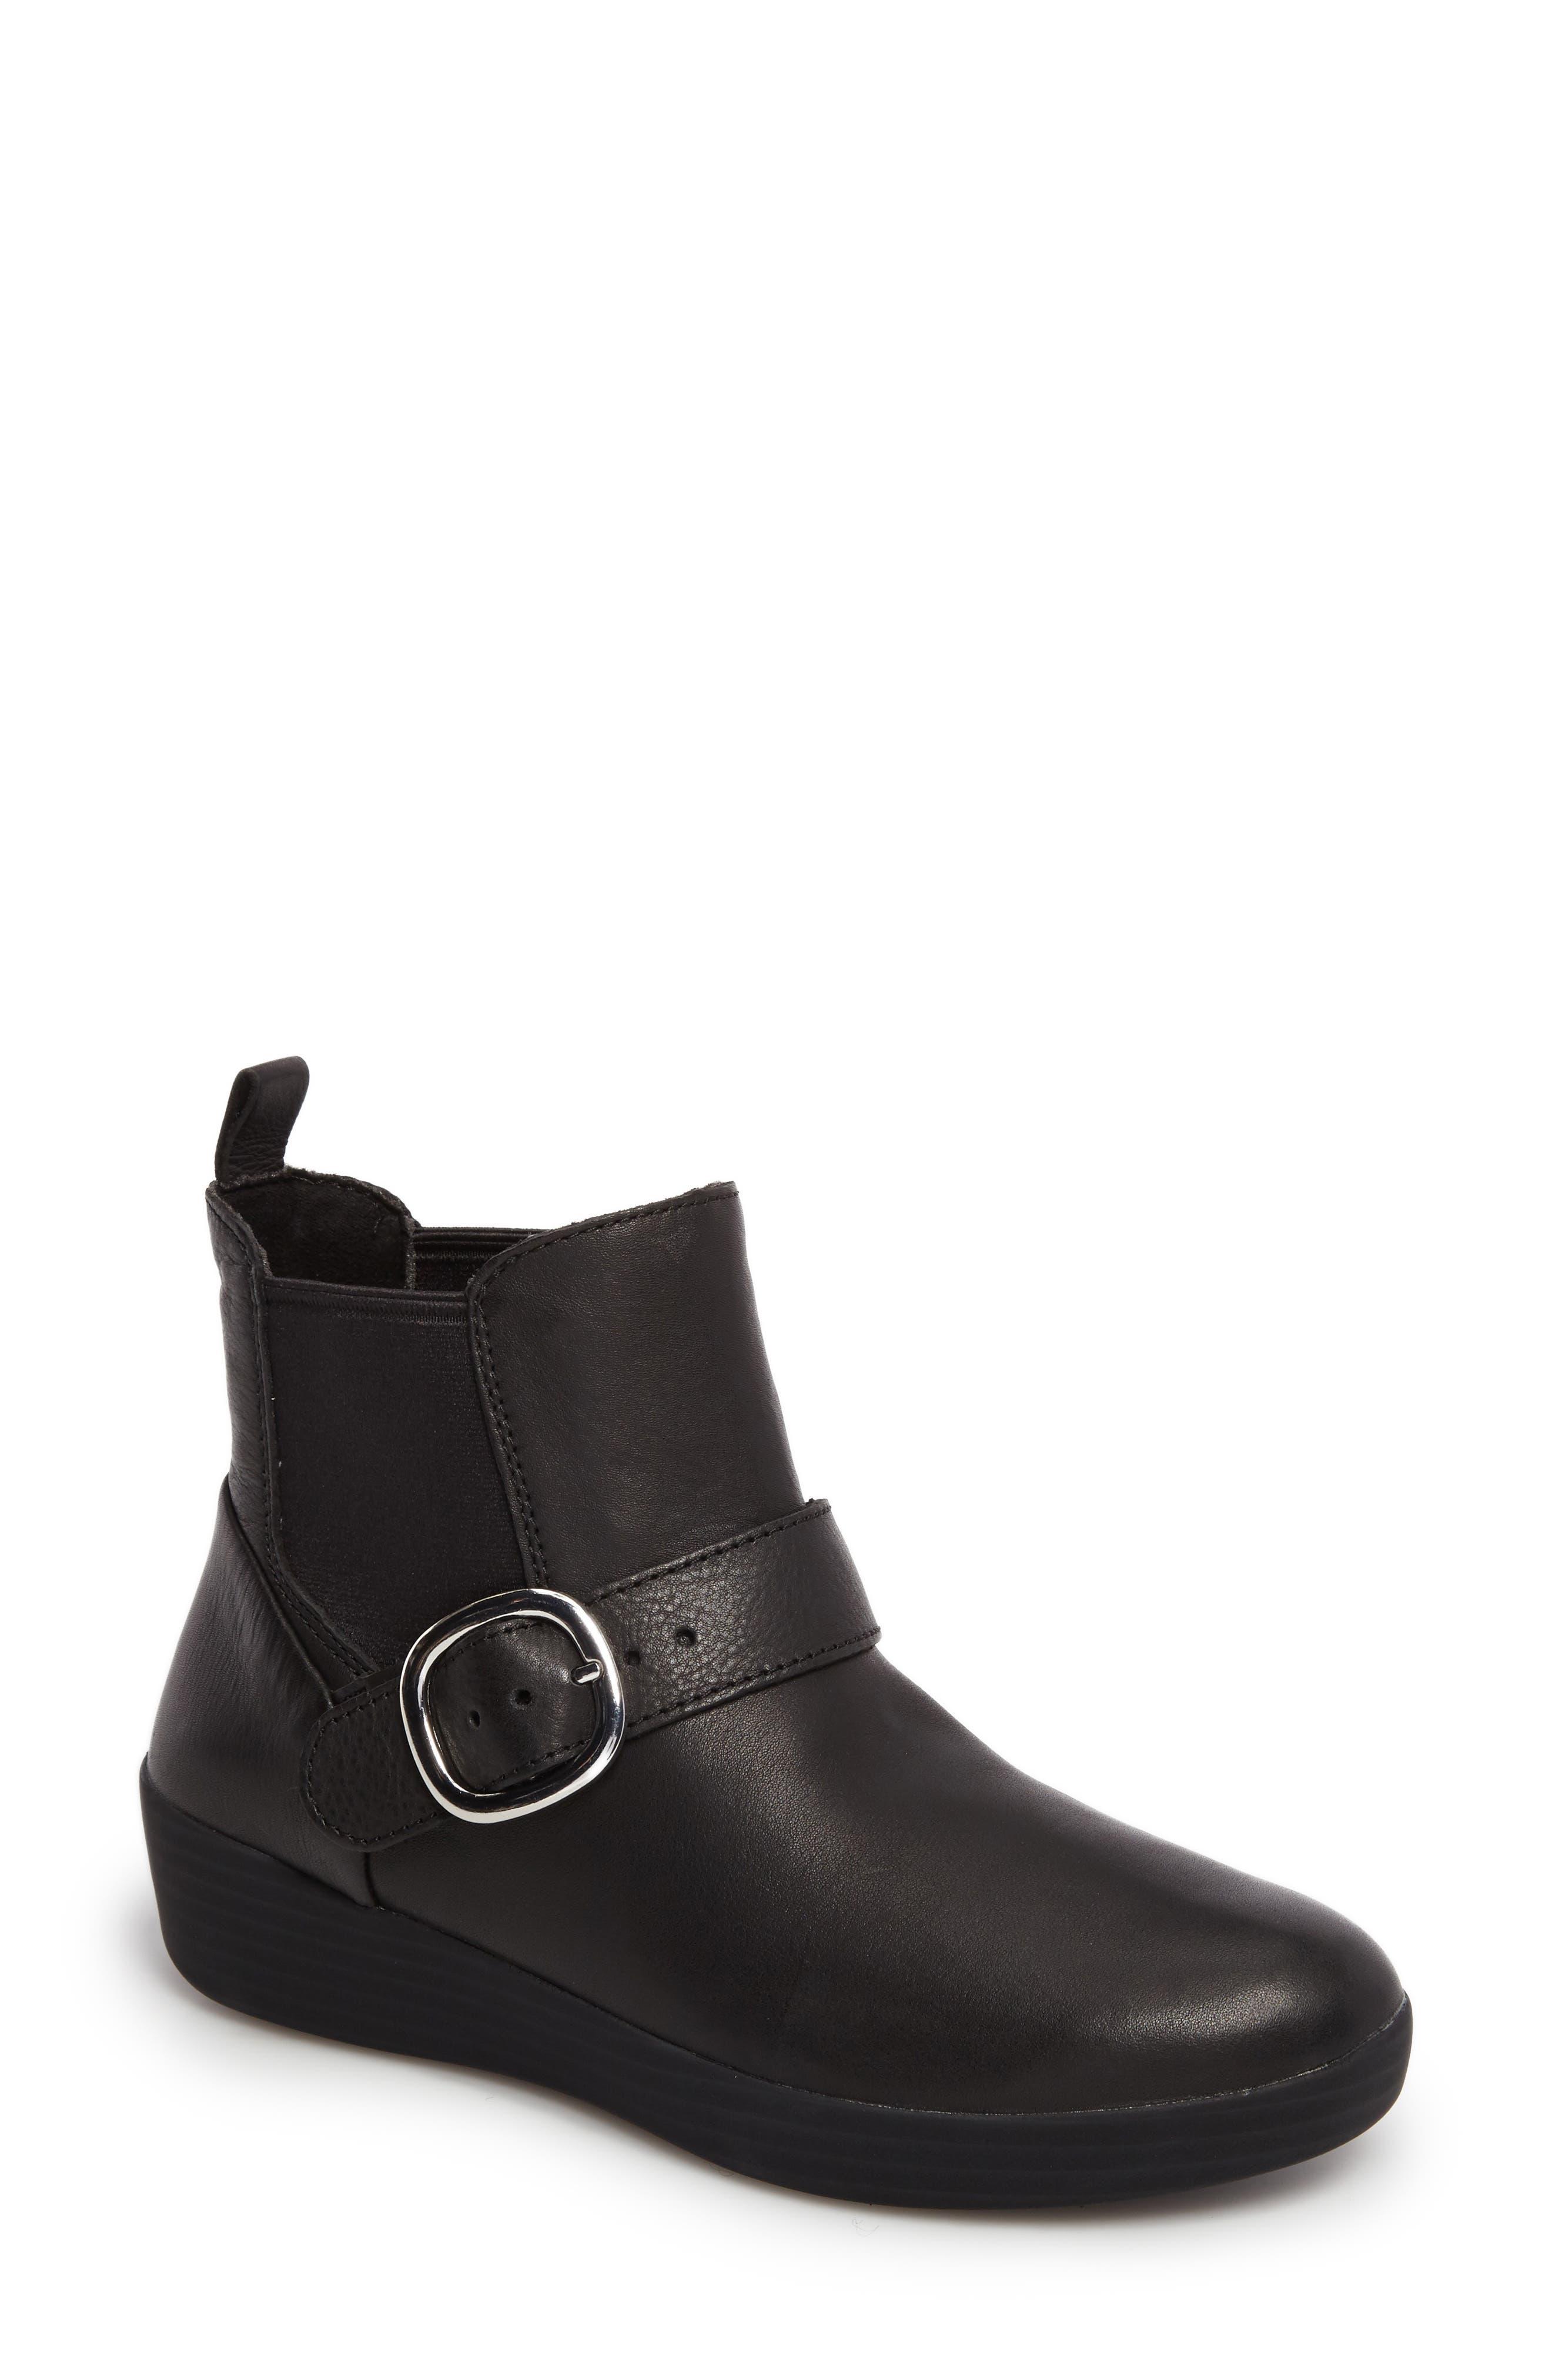 Superbuckle Chelsea Boot,                         Main,                         color, Black